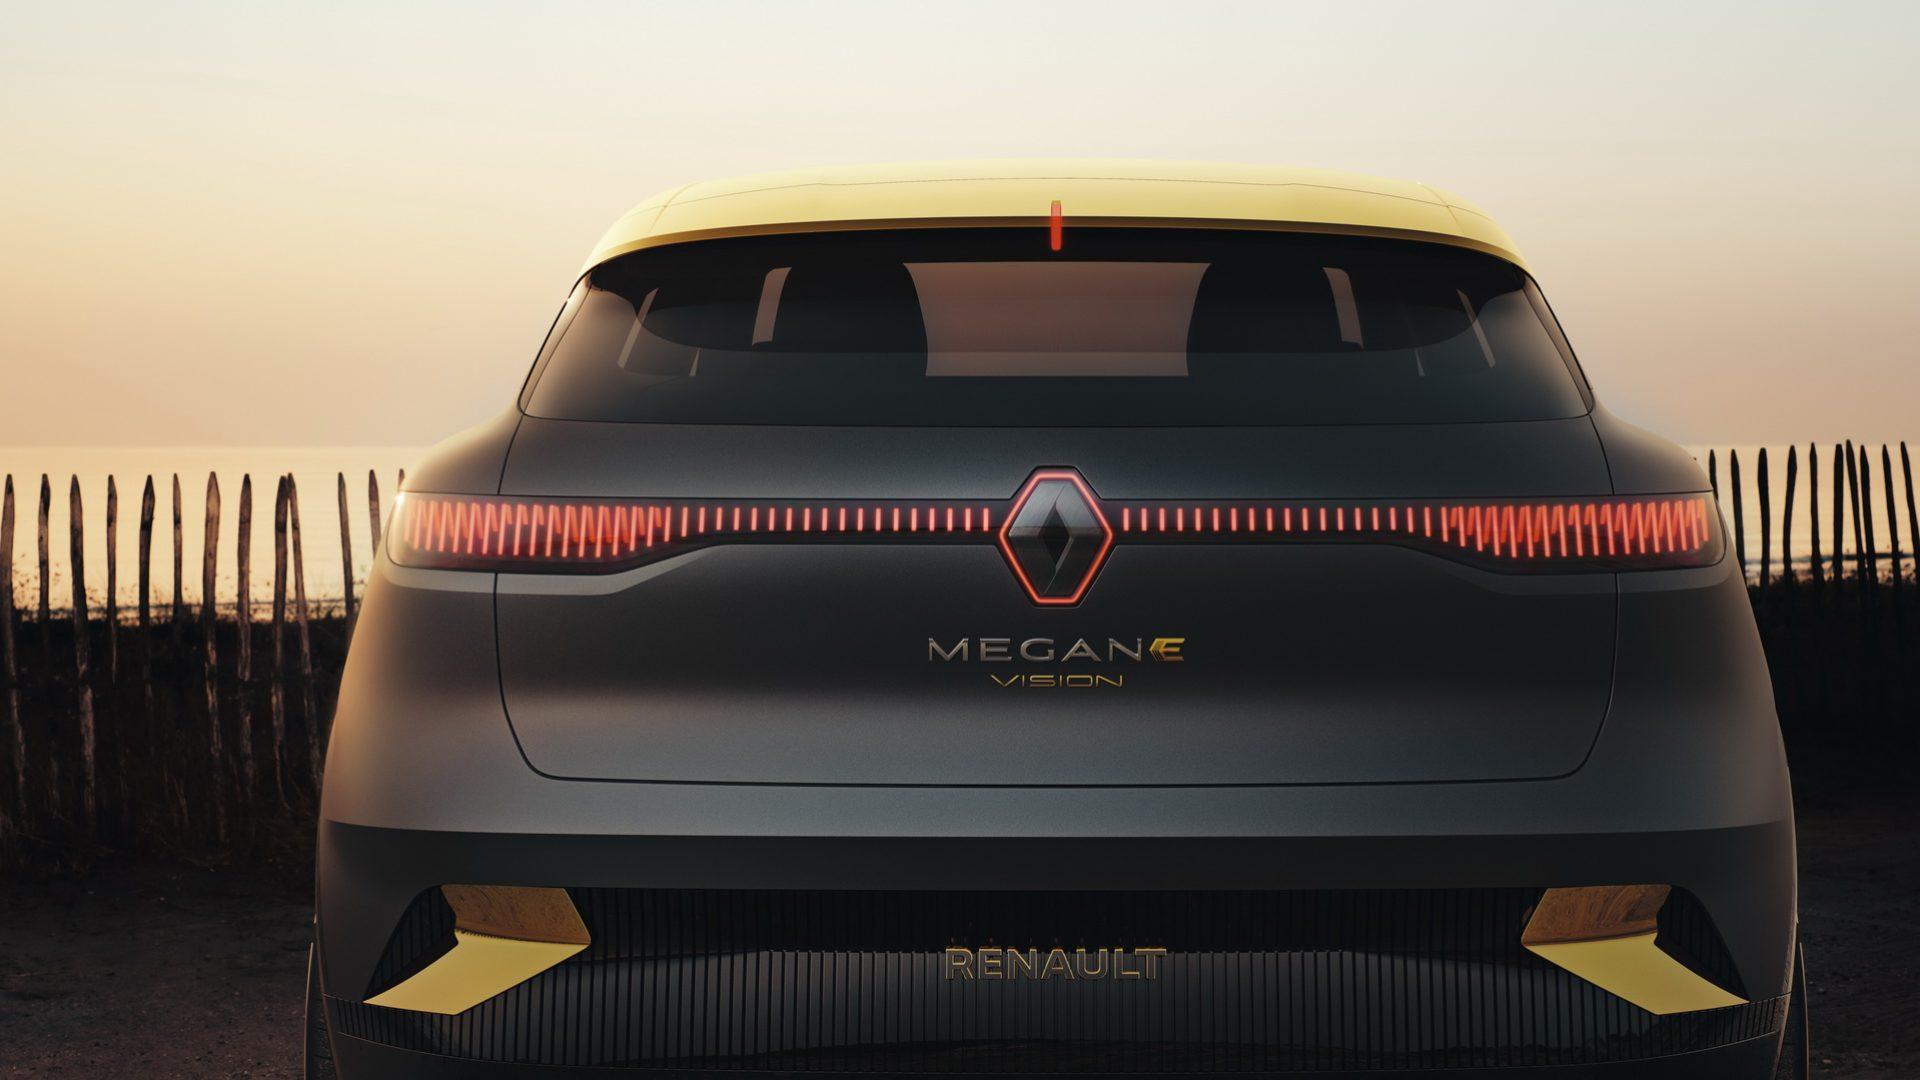 2020-Renault-Megane-eVision-Concept-10